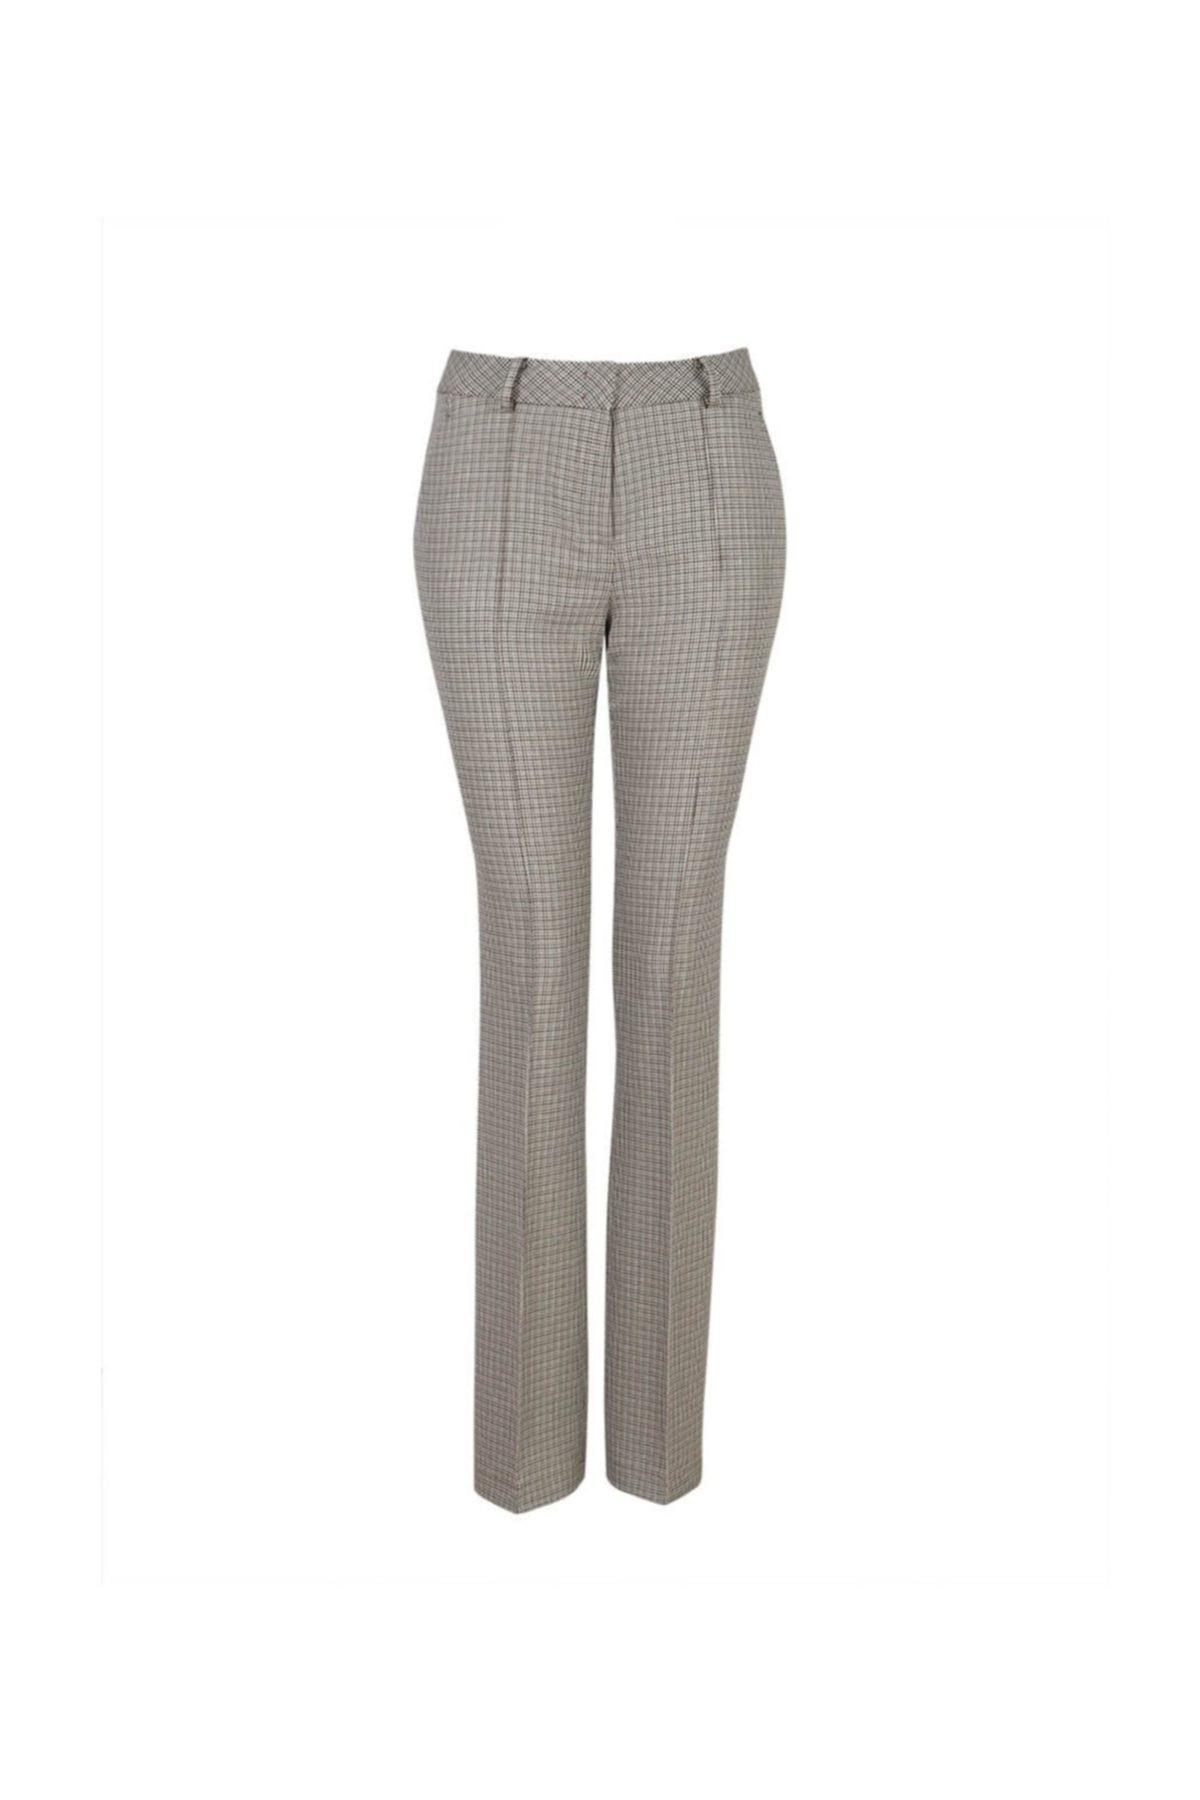 Chima Yarım Ispanyol Pantolon 1